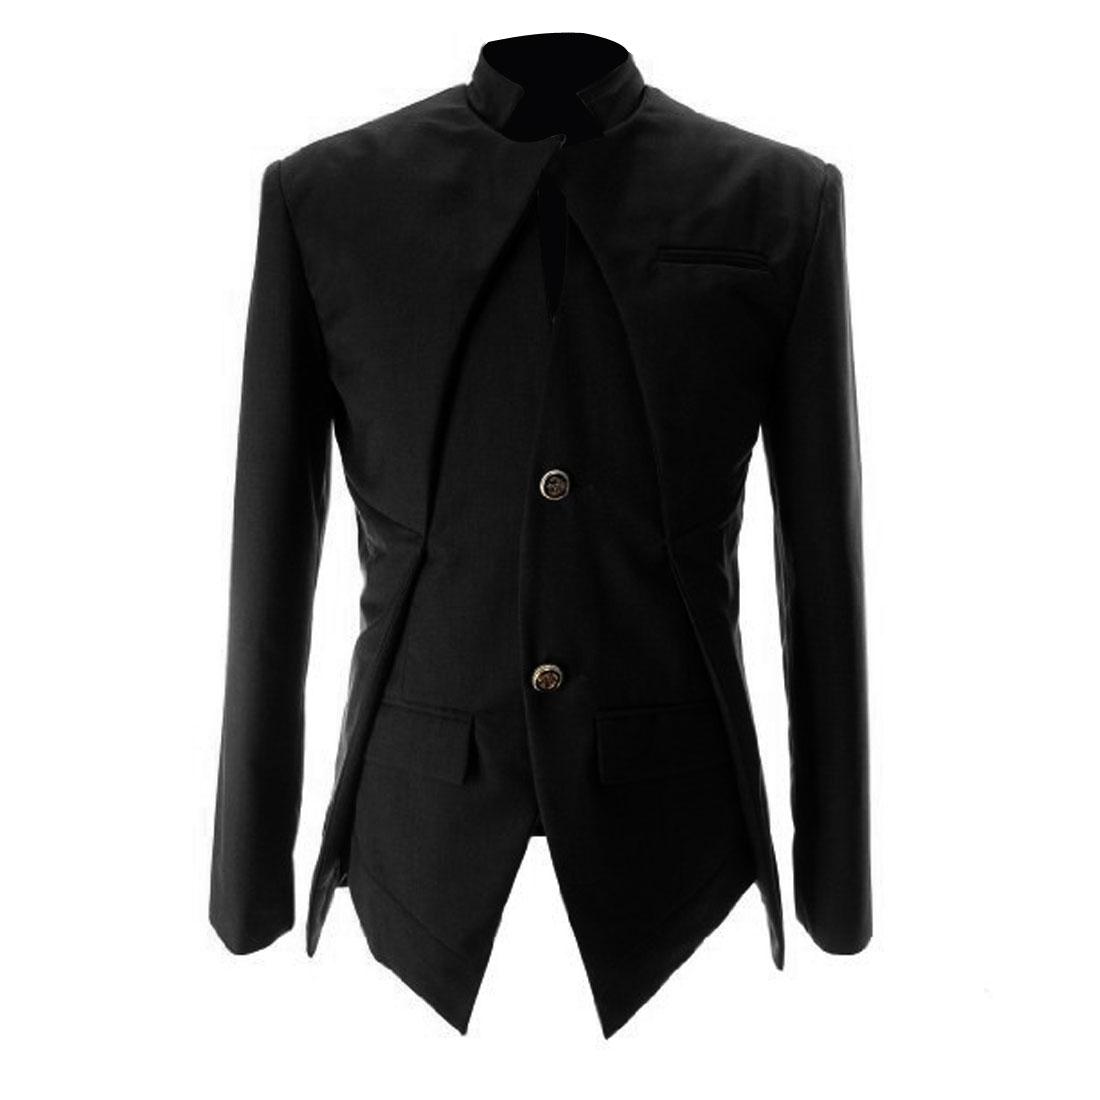 Men Pure Black Two-Button Front Closure Irregular Hem Blazer Jacket S